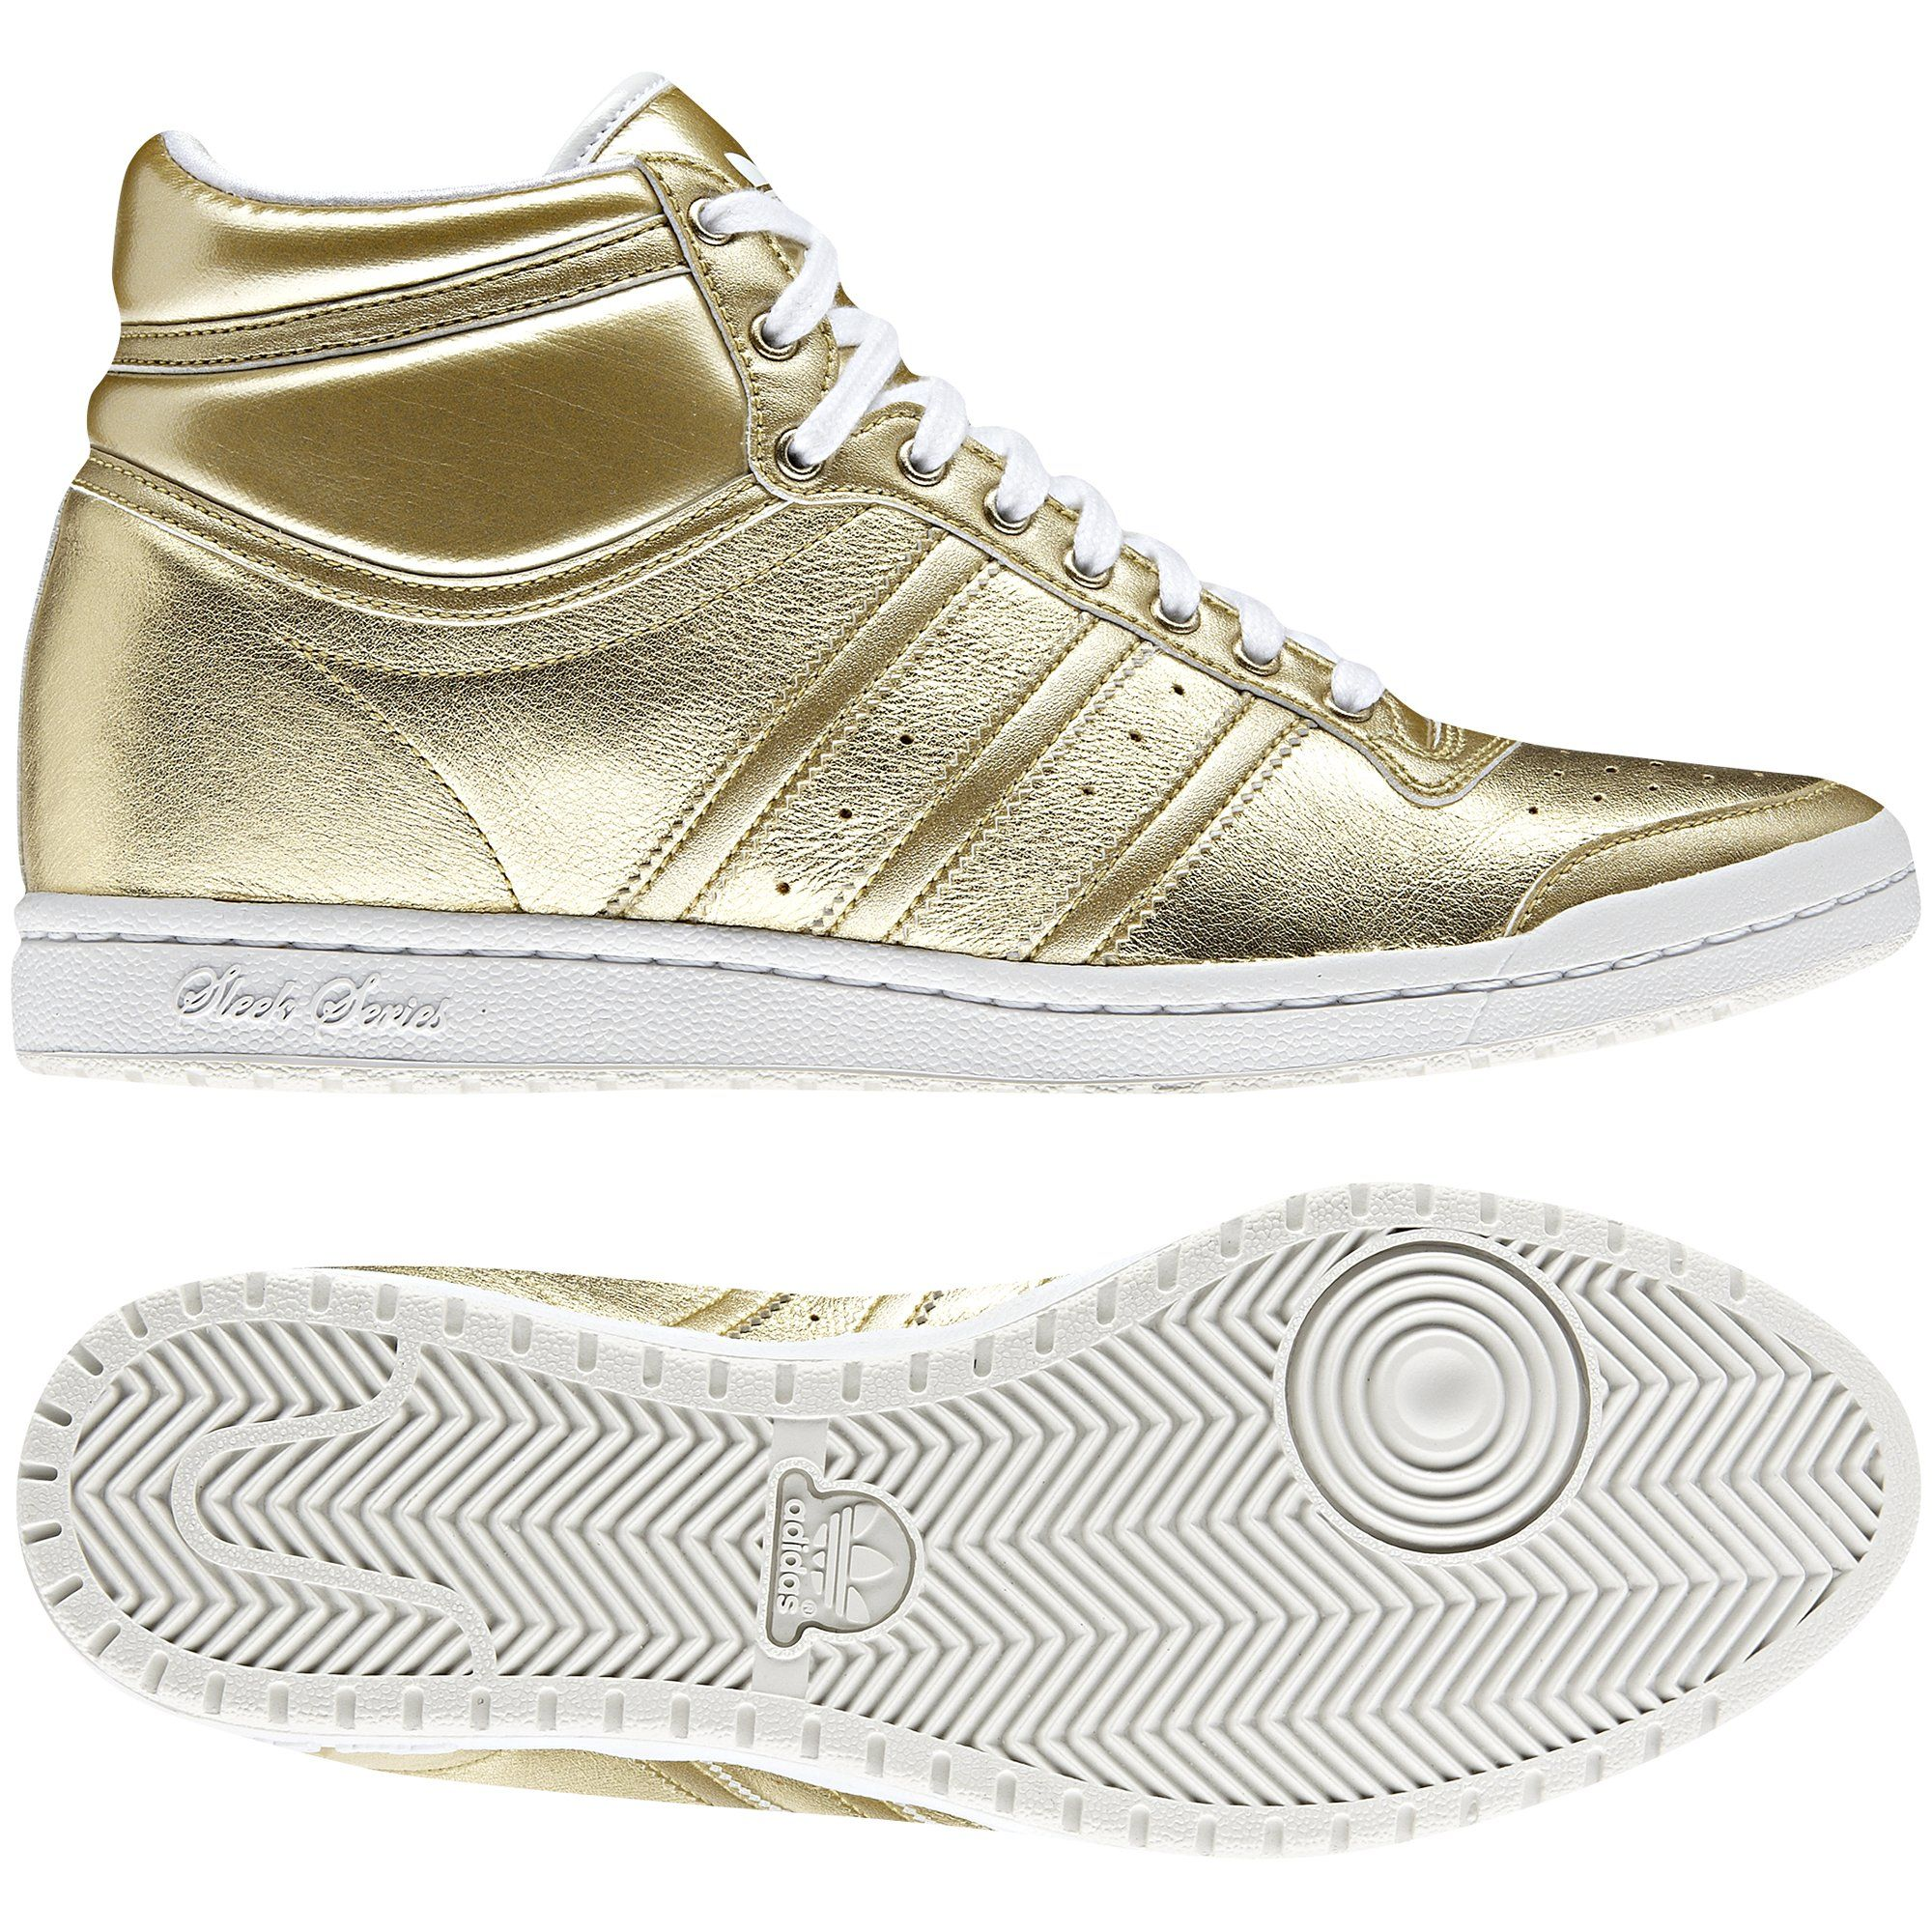 Adidas. TOP TEN HI SLEEK W HEEL Mujer, Metallic Gold